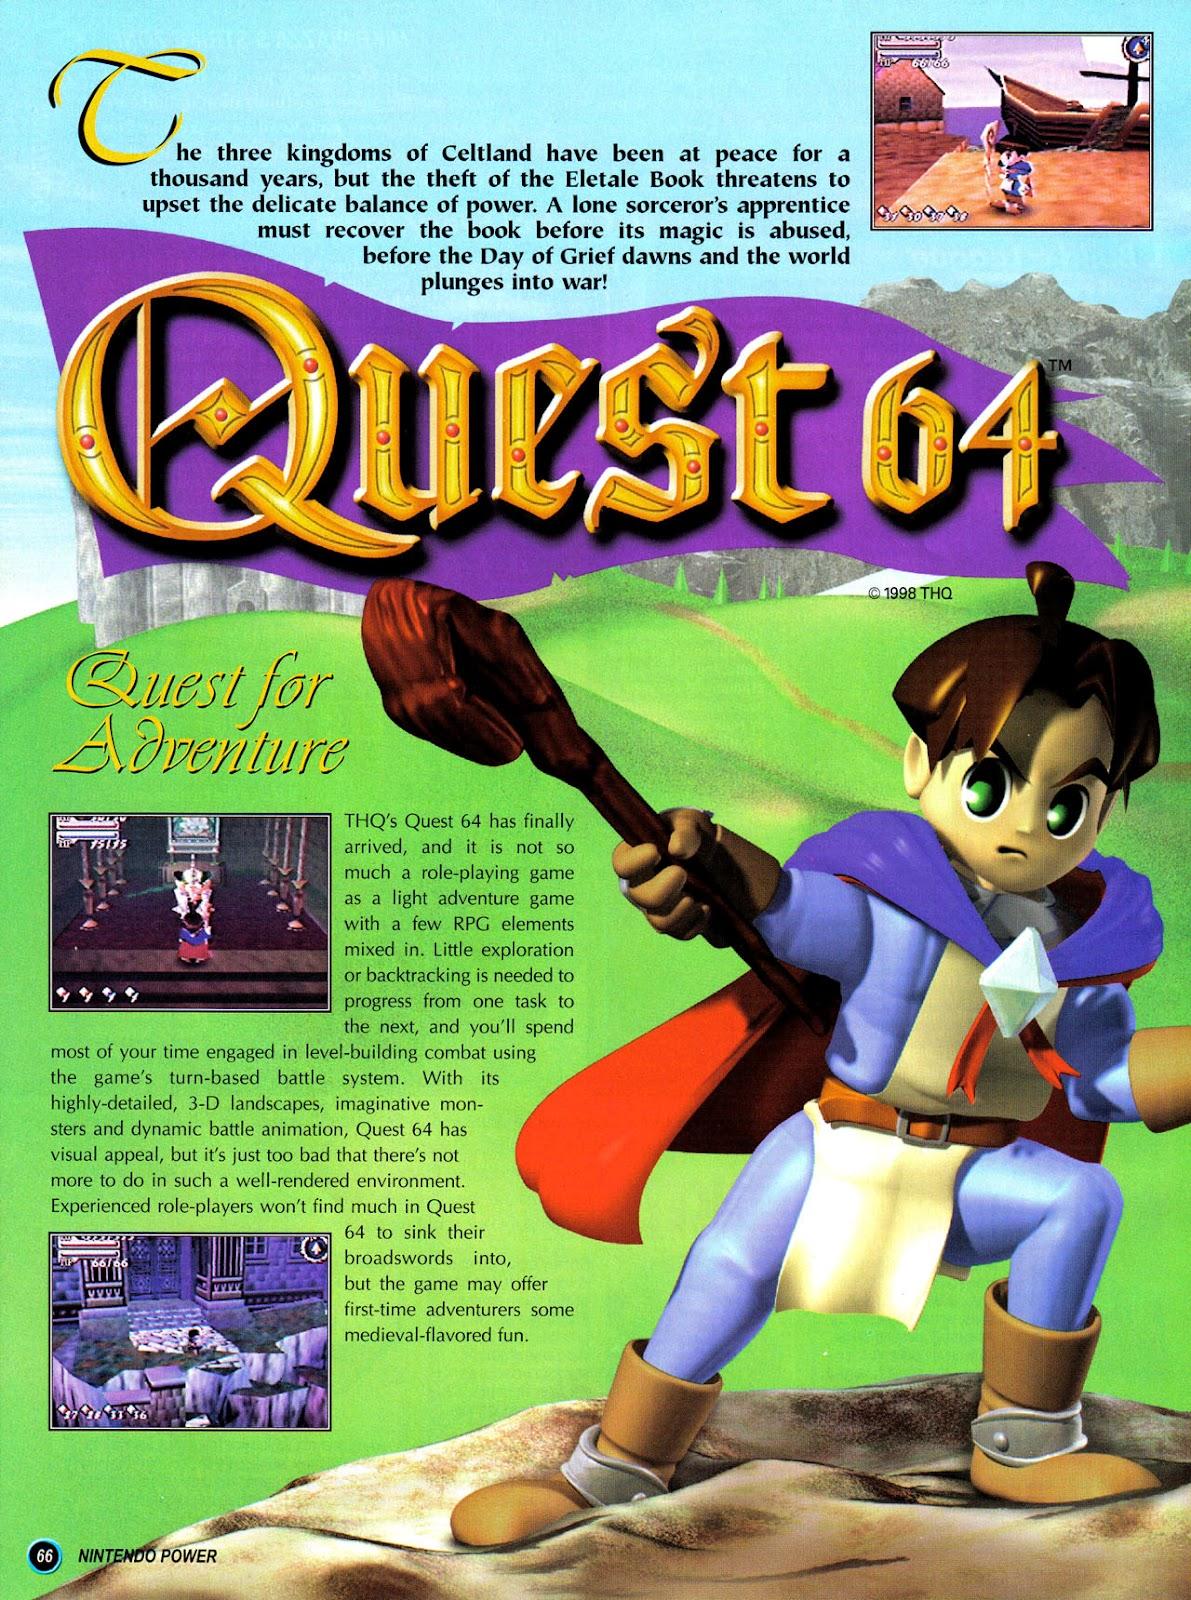 Comic Nintendo Power issue 110